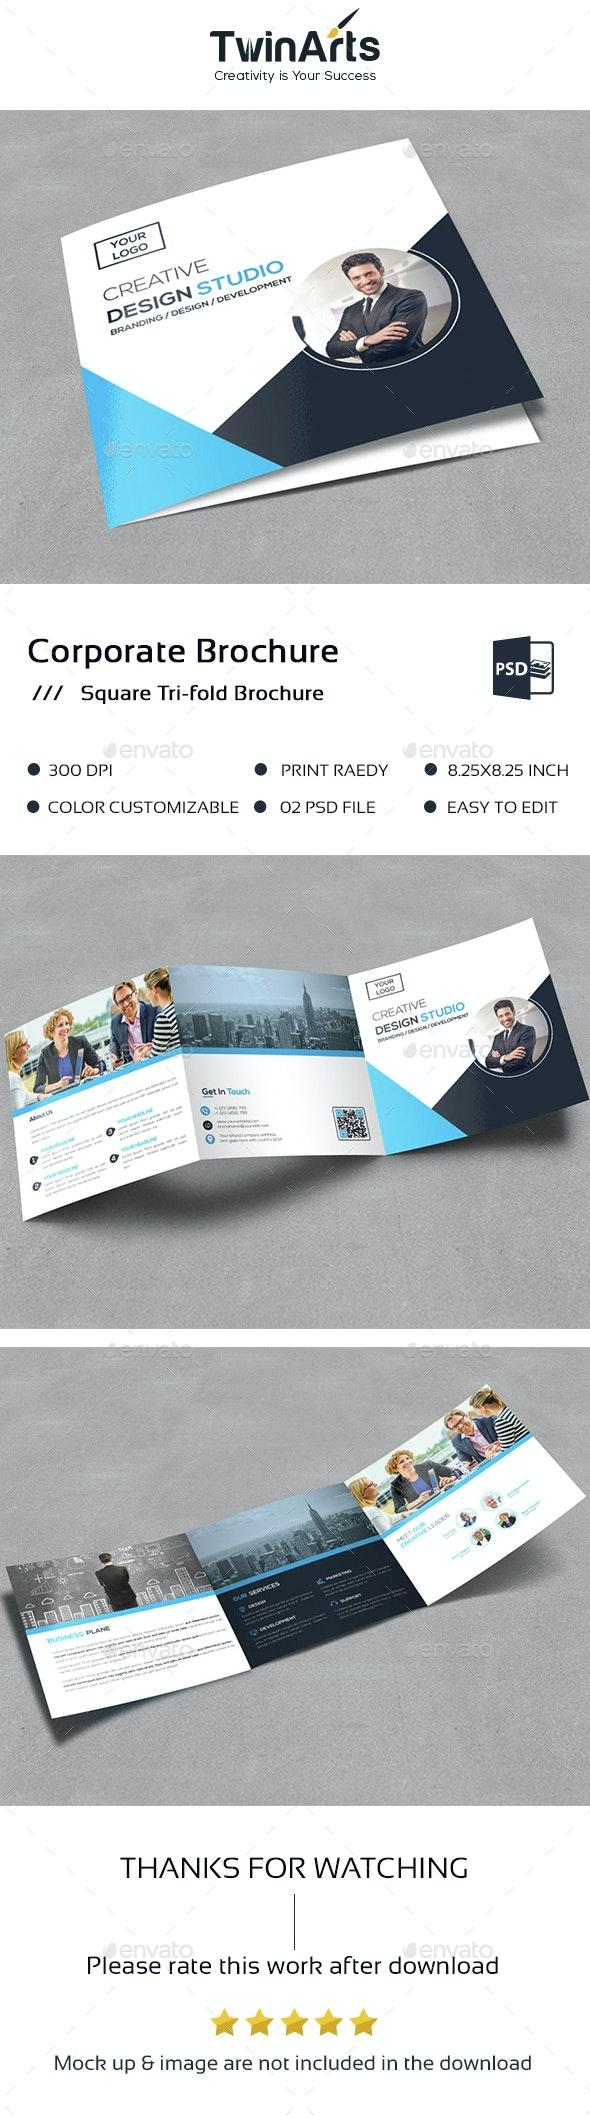 Corporate Squre Trifold Brochure - Brochures Print Templates